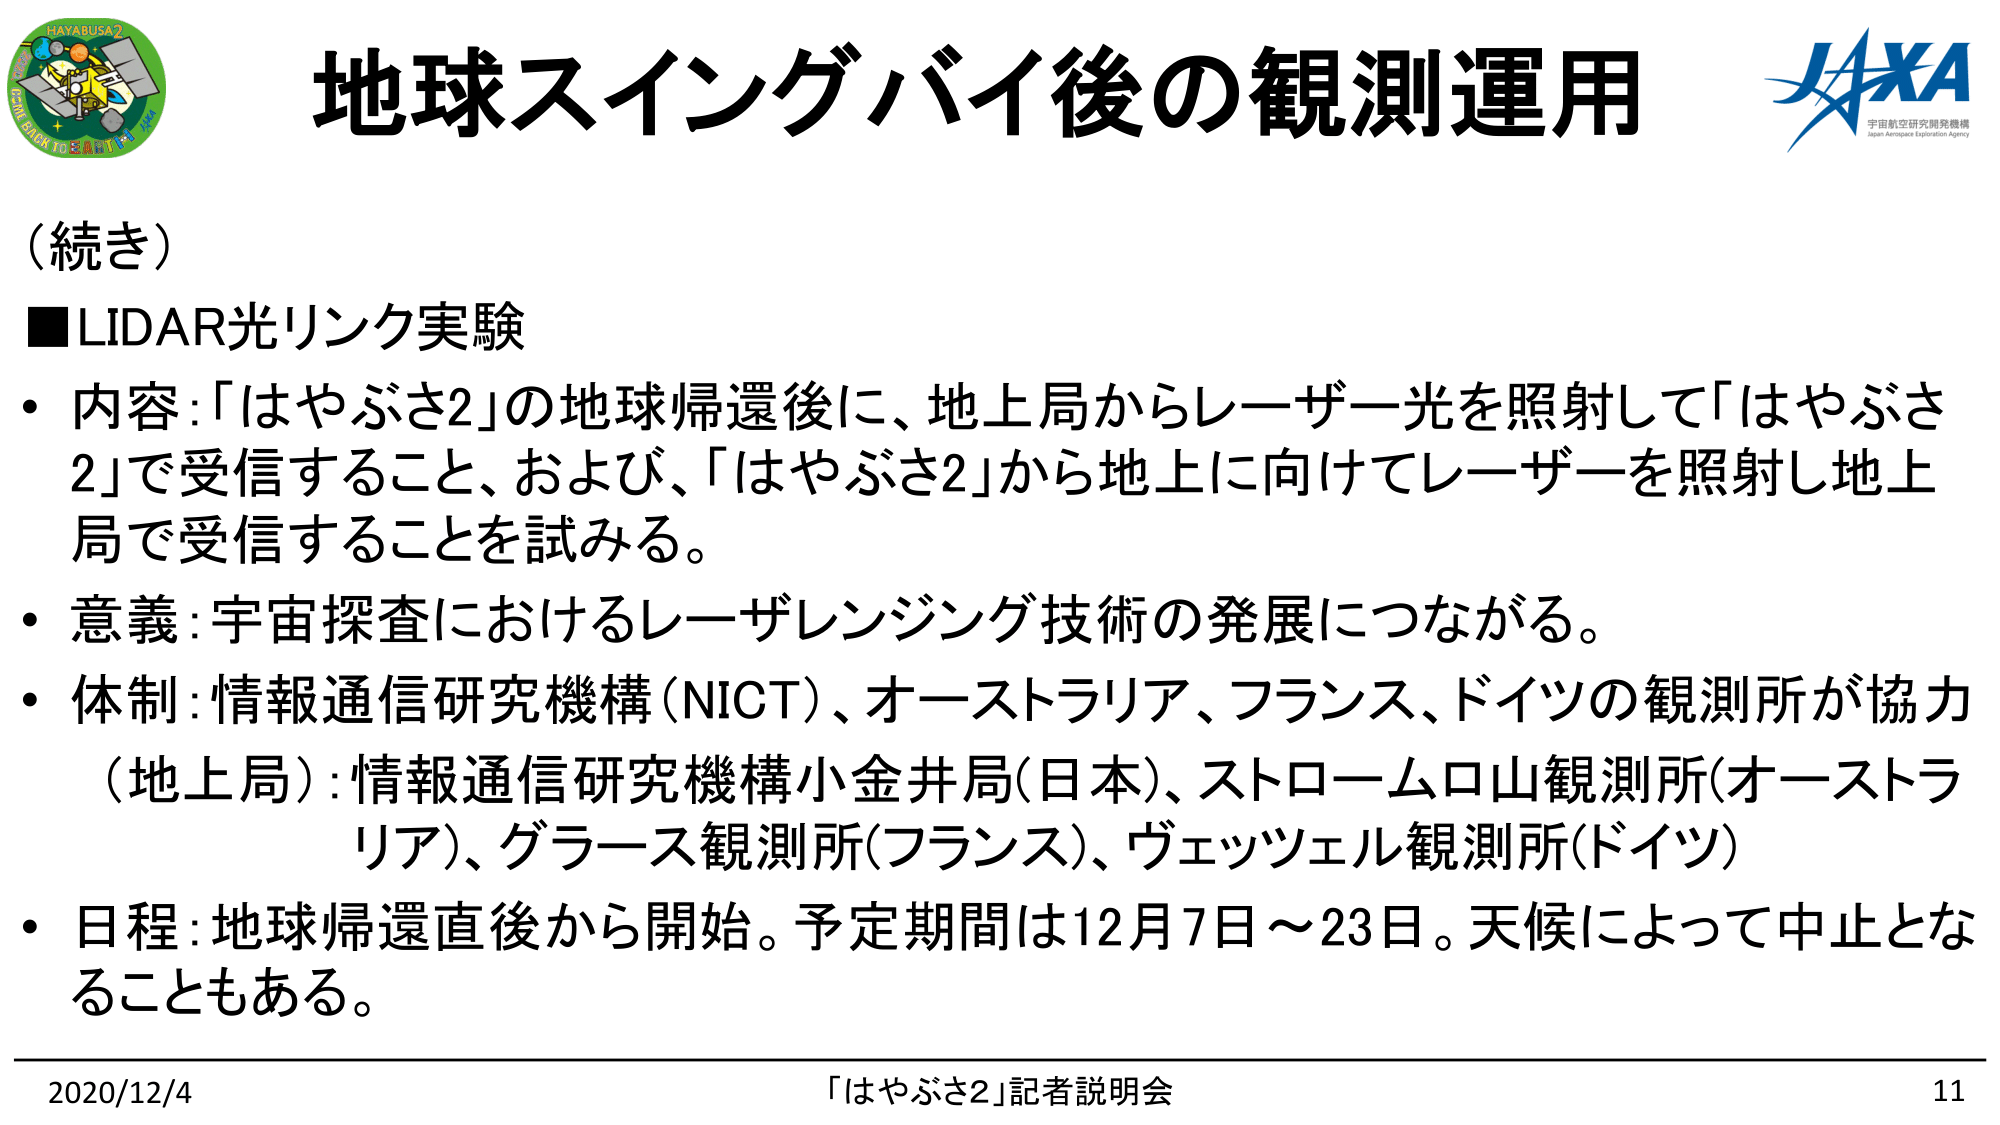 f:id:Imamura:20201204153838p:plain